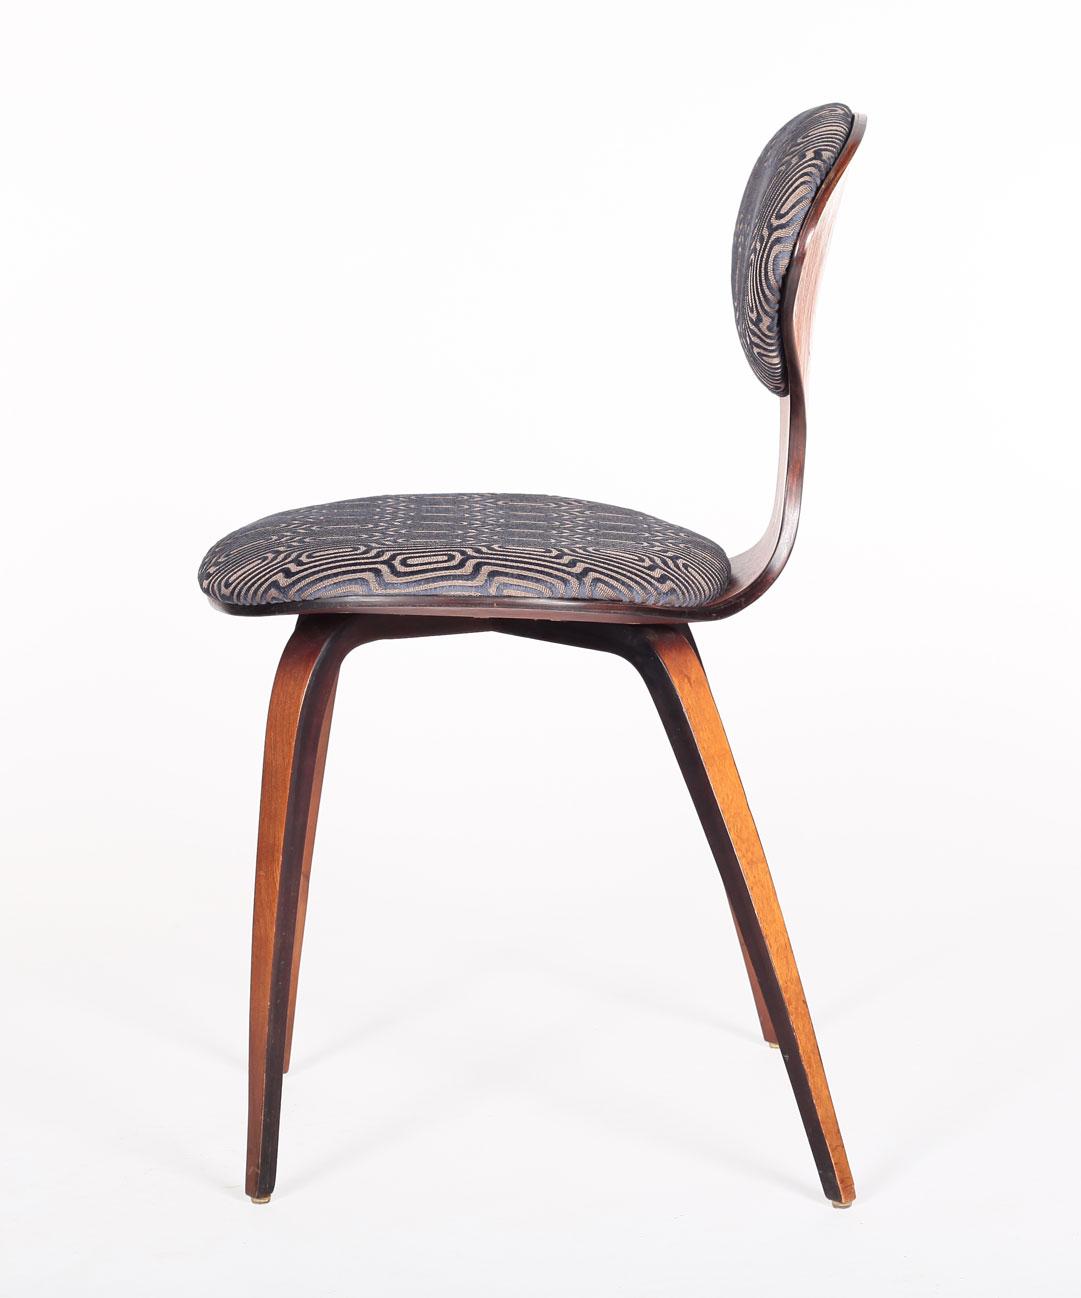 Plycraft Chair